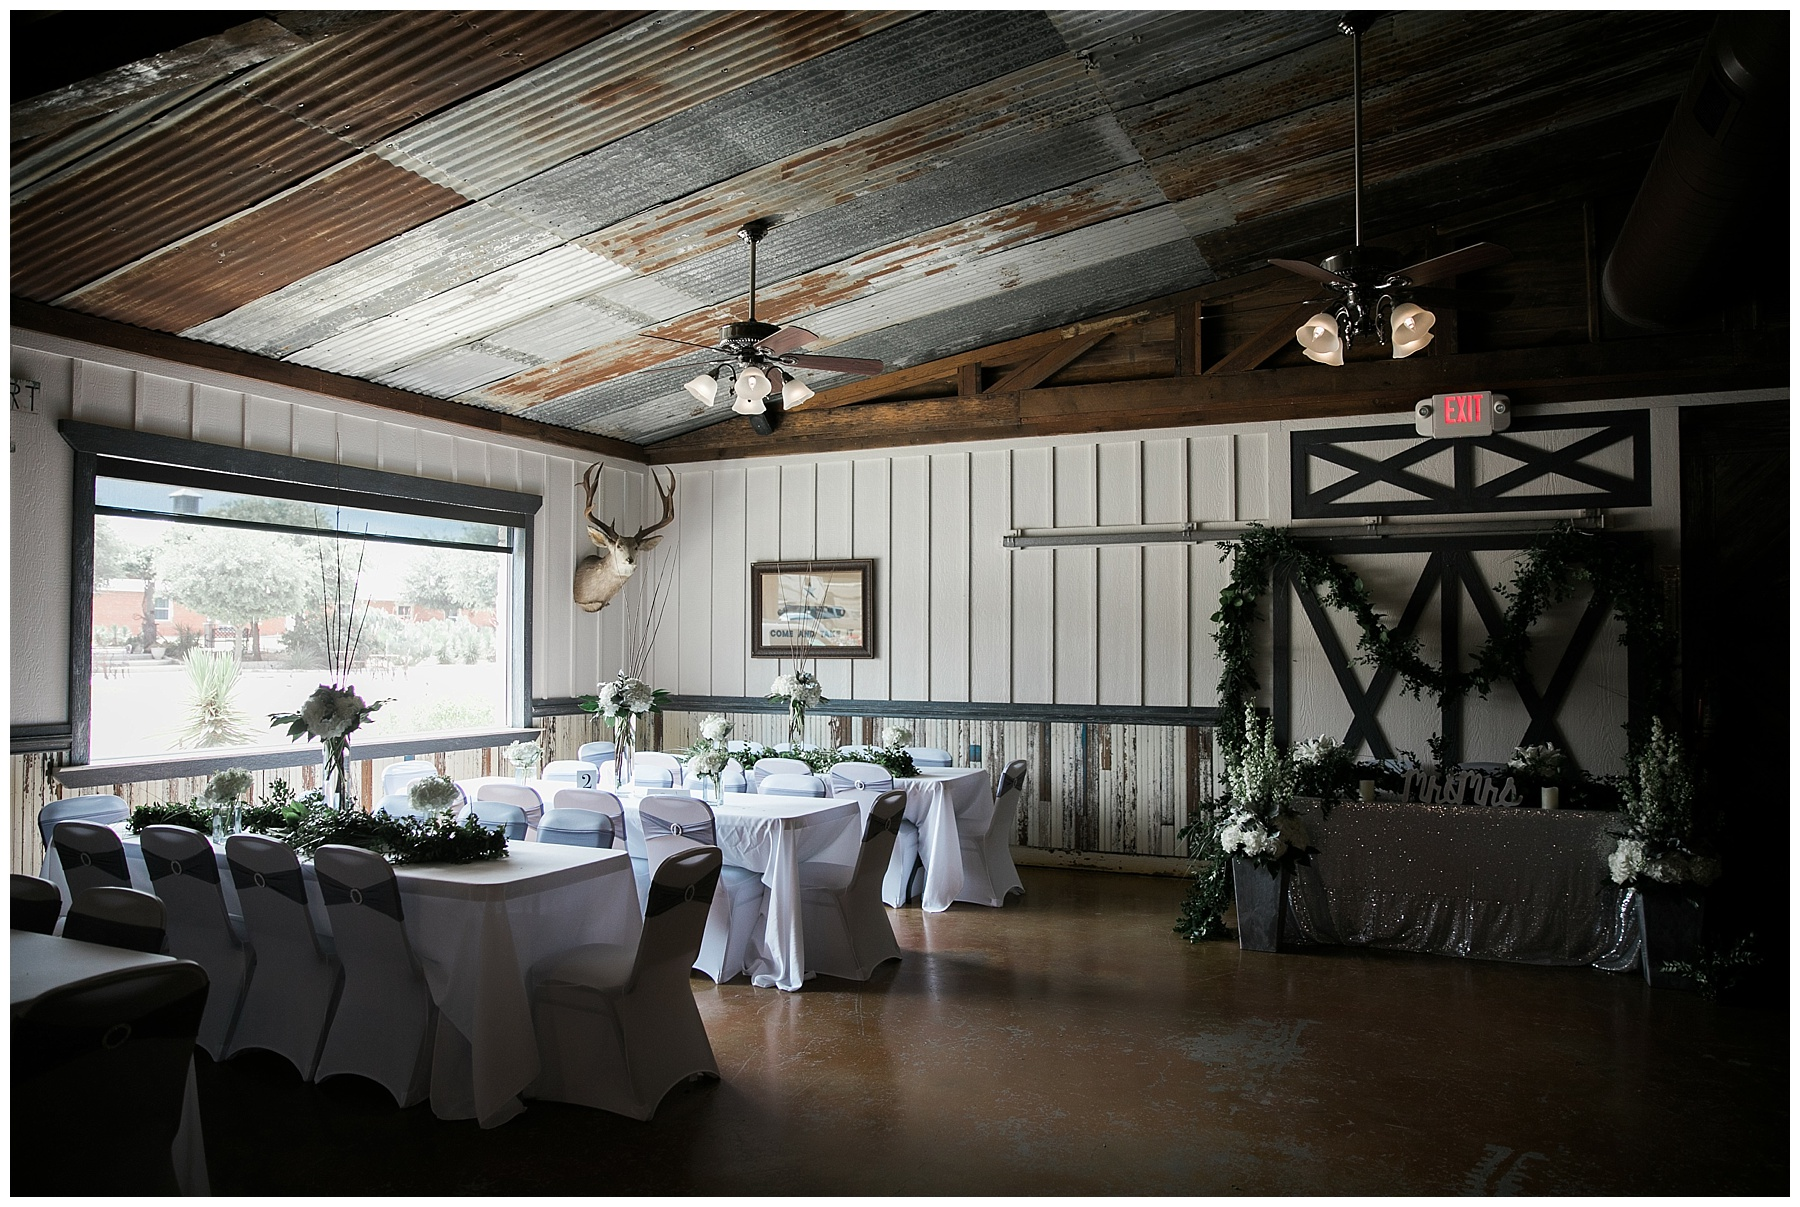 sacred-heart-catholic-church-muenster-tx-the-veranda-in-nocona-tx-wichita-falls-wedding-photographer-00035.jpg